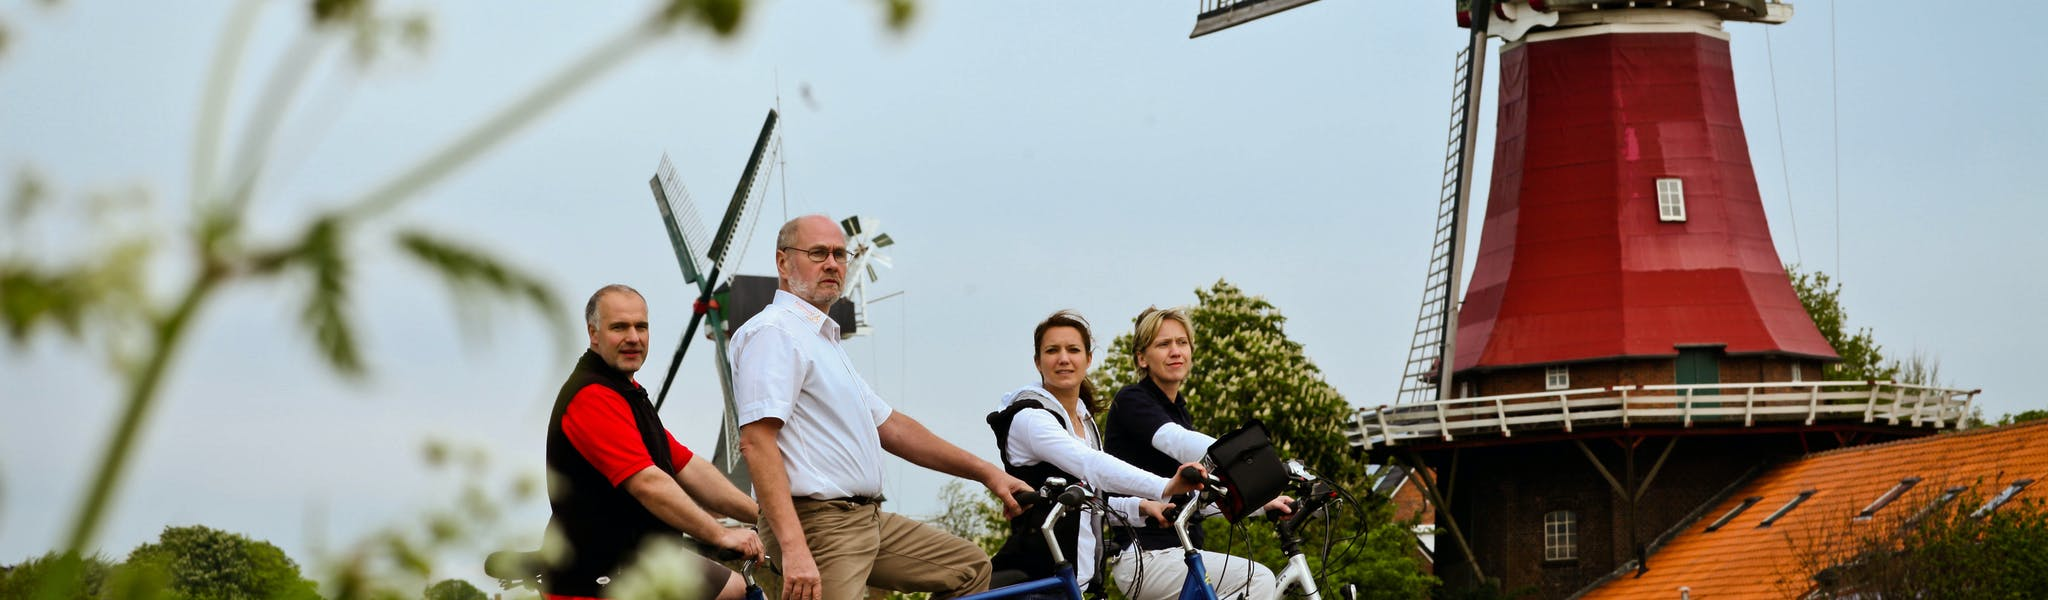 fietsvakanties elbe noord